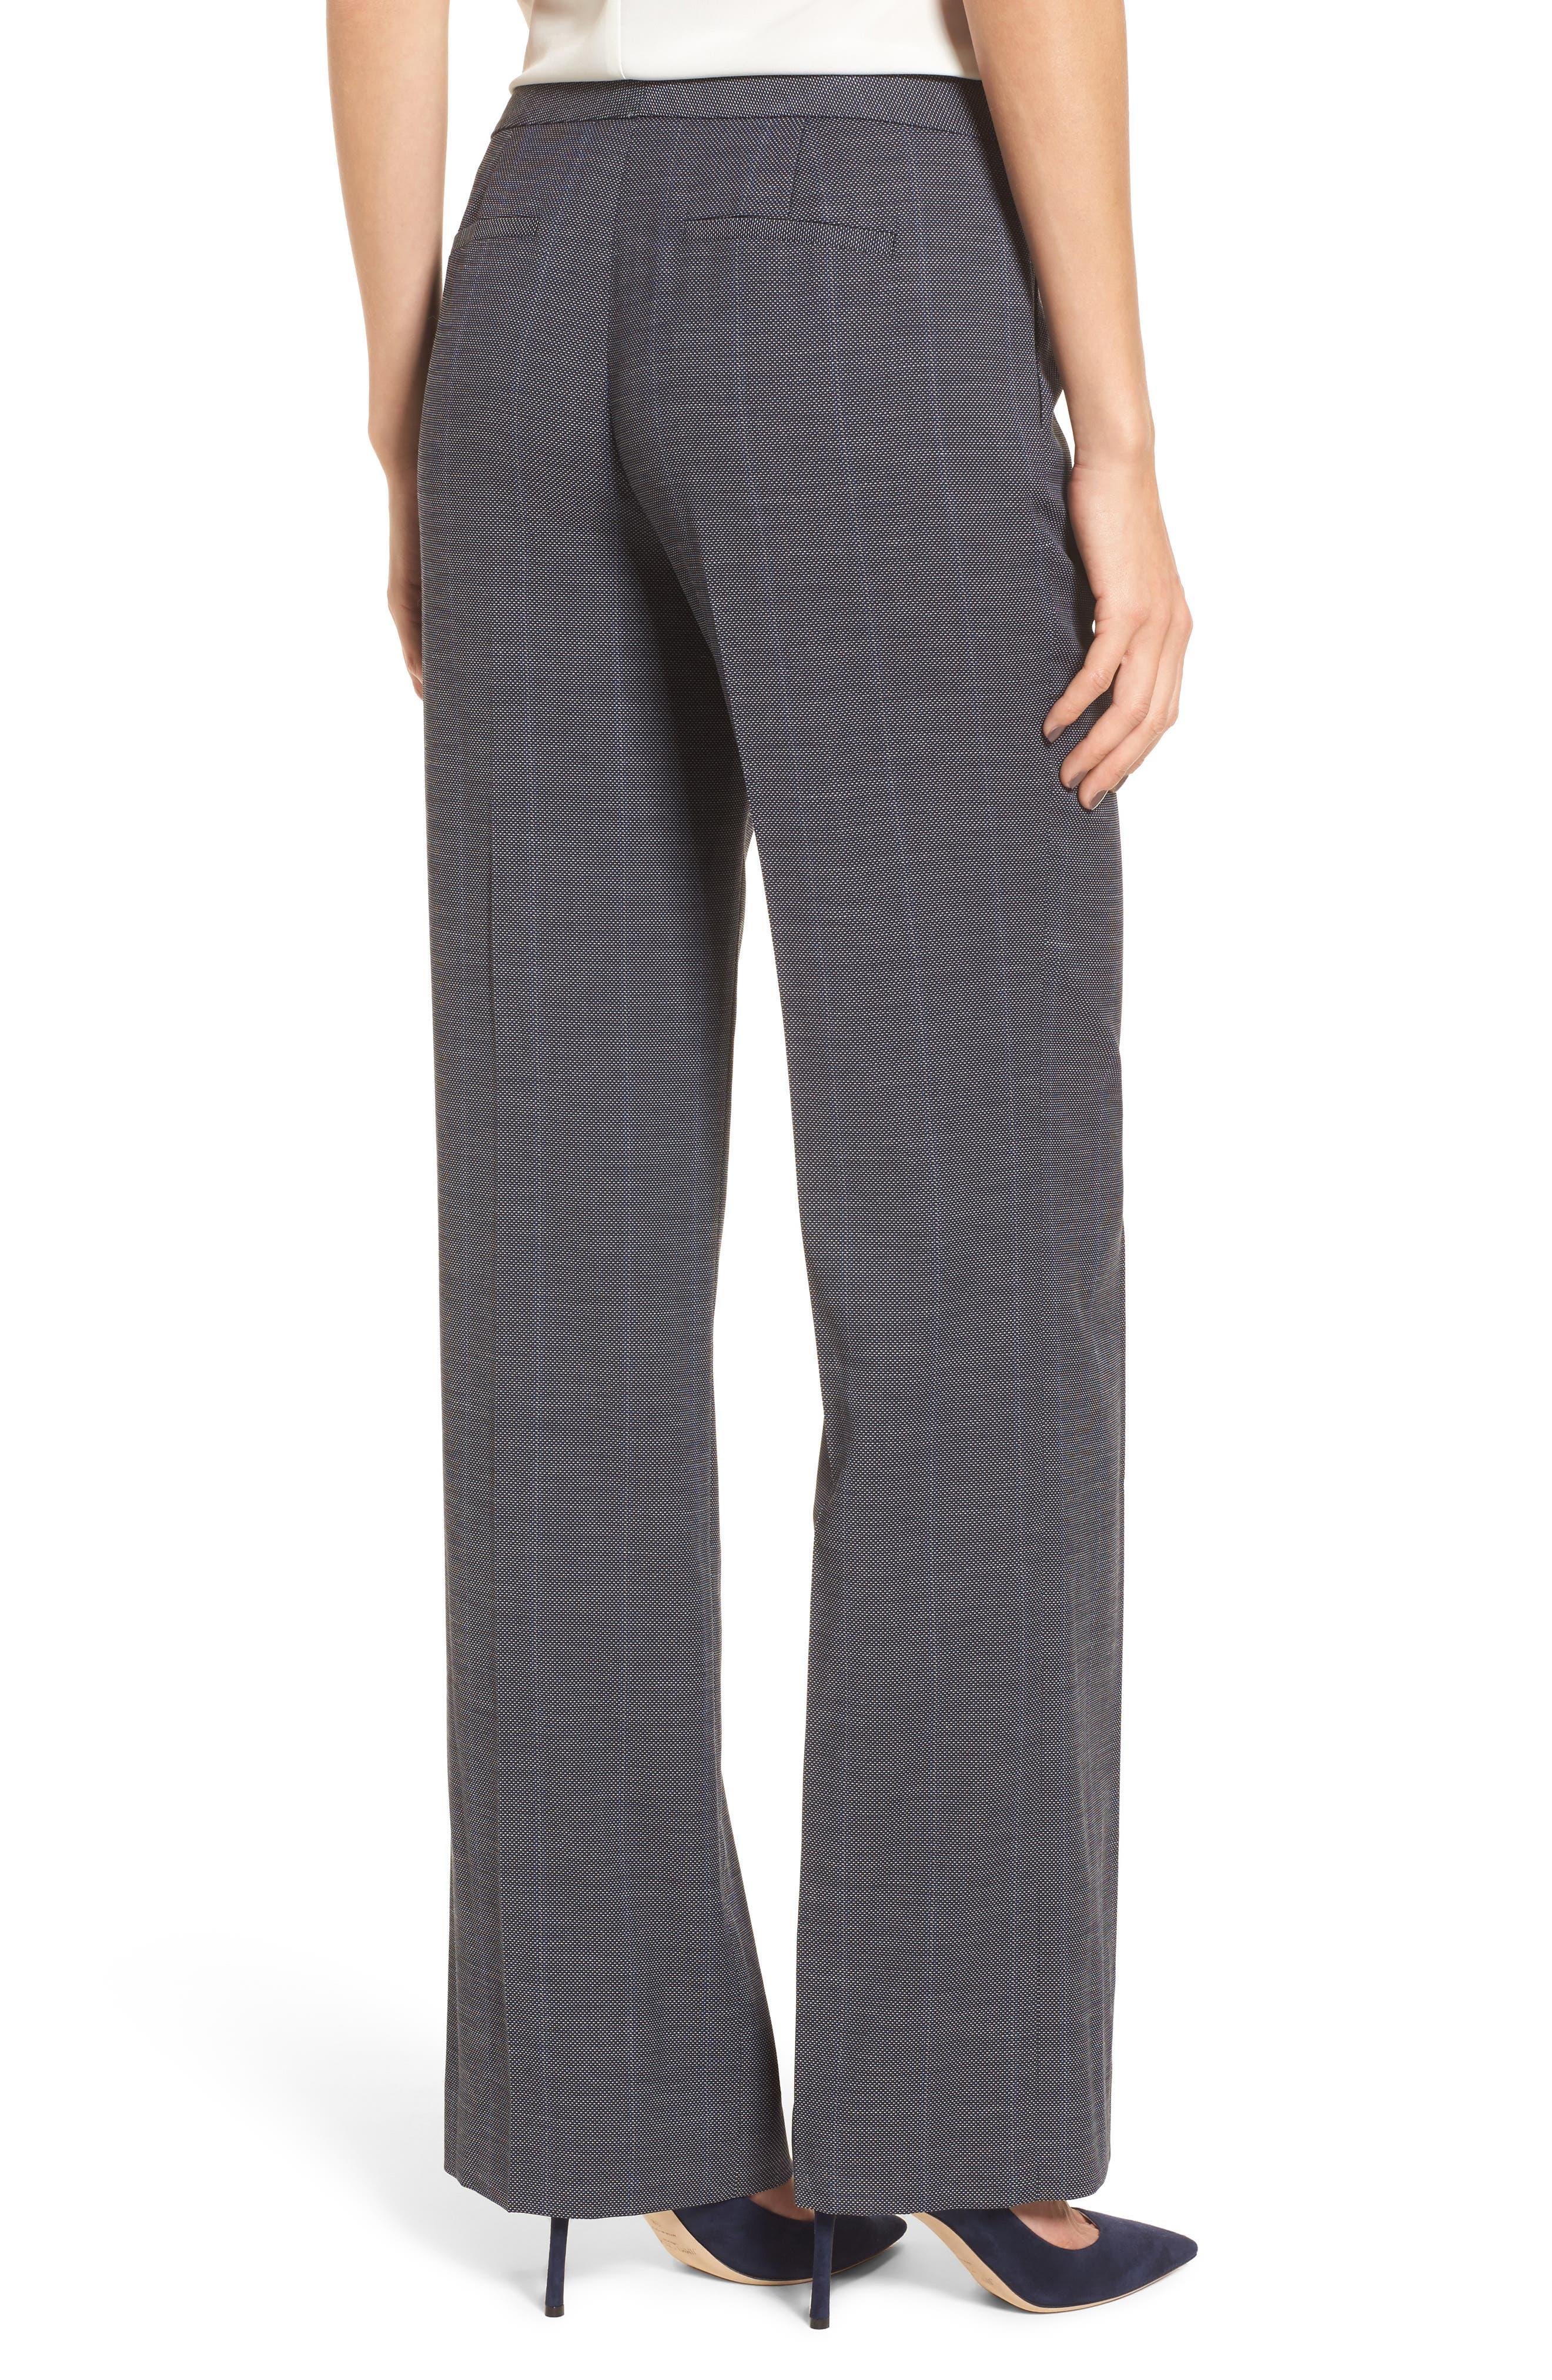 Cross Dye Suit Pants,                             Alternate thumbnail 2, color,                             Navy Crossdye Pattern